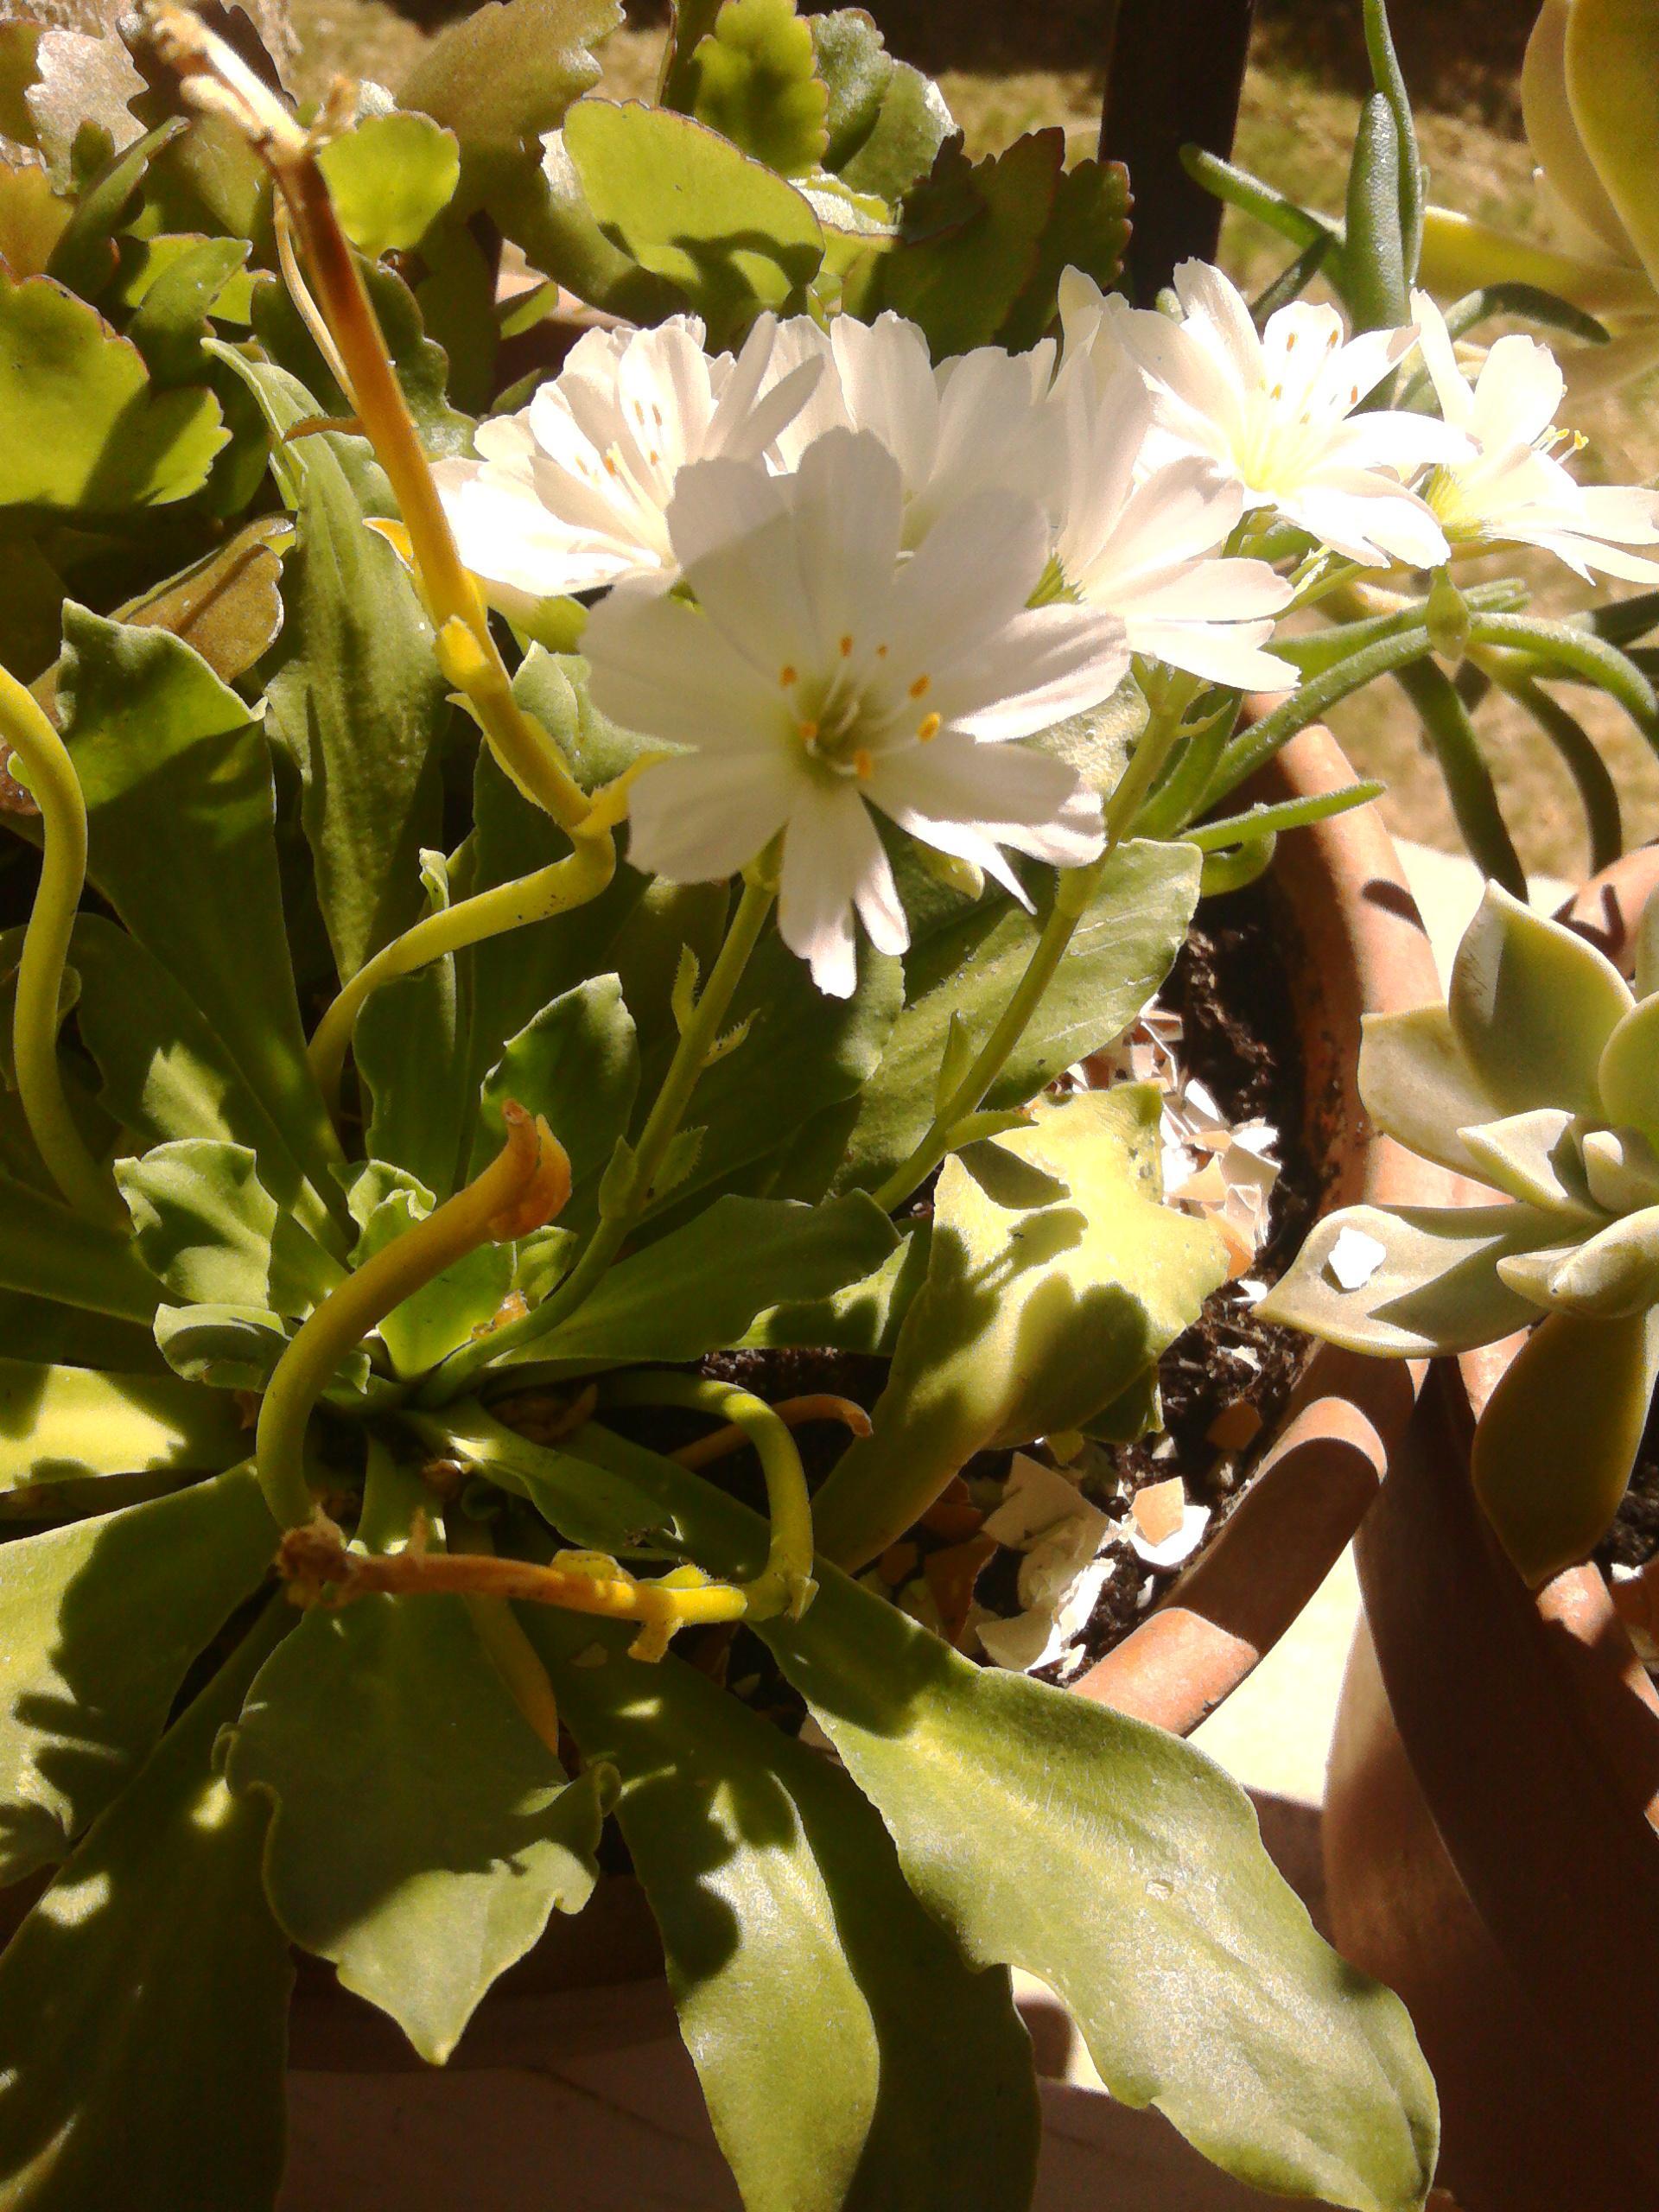 https://forum.jardiner-malin.fr/wp-content/uploads/sites/2/hm_bbpui/152001/dgn1kga58yijoidq6van2yzvchz0e5m2.jpg